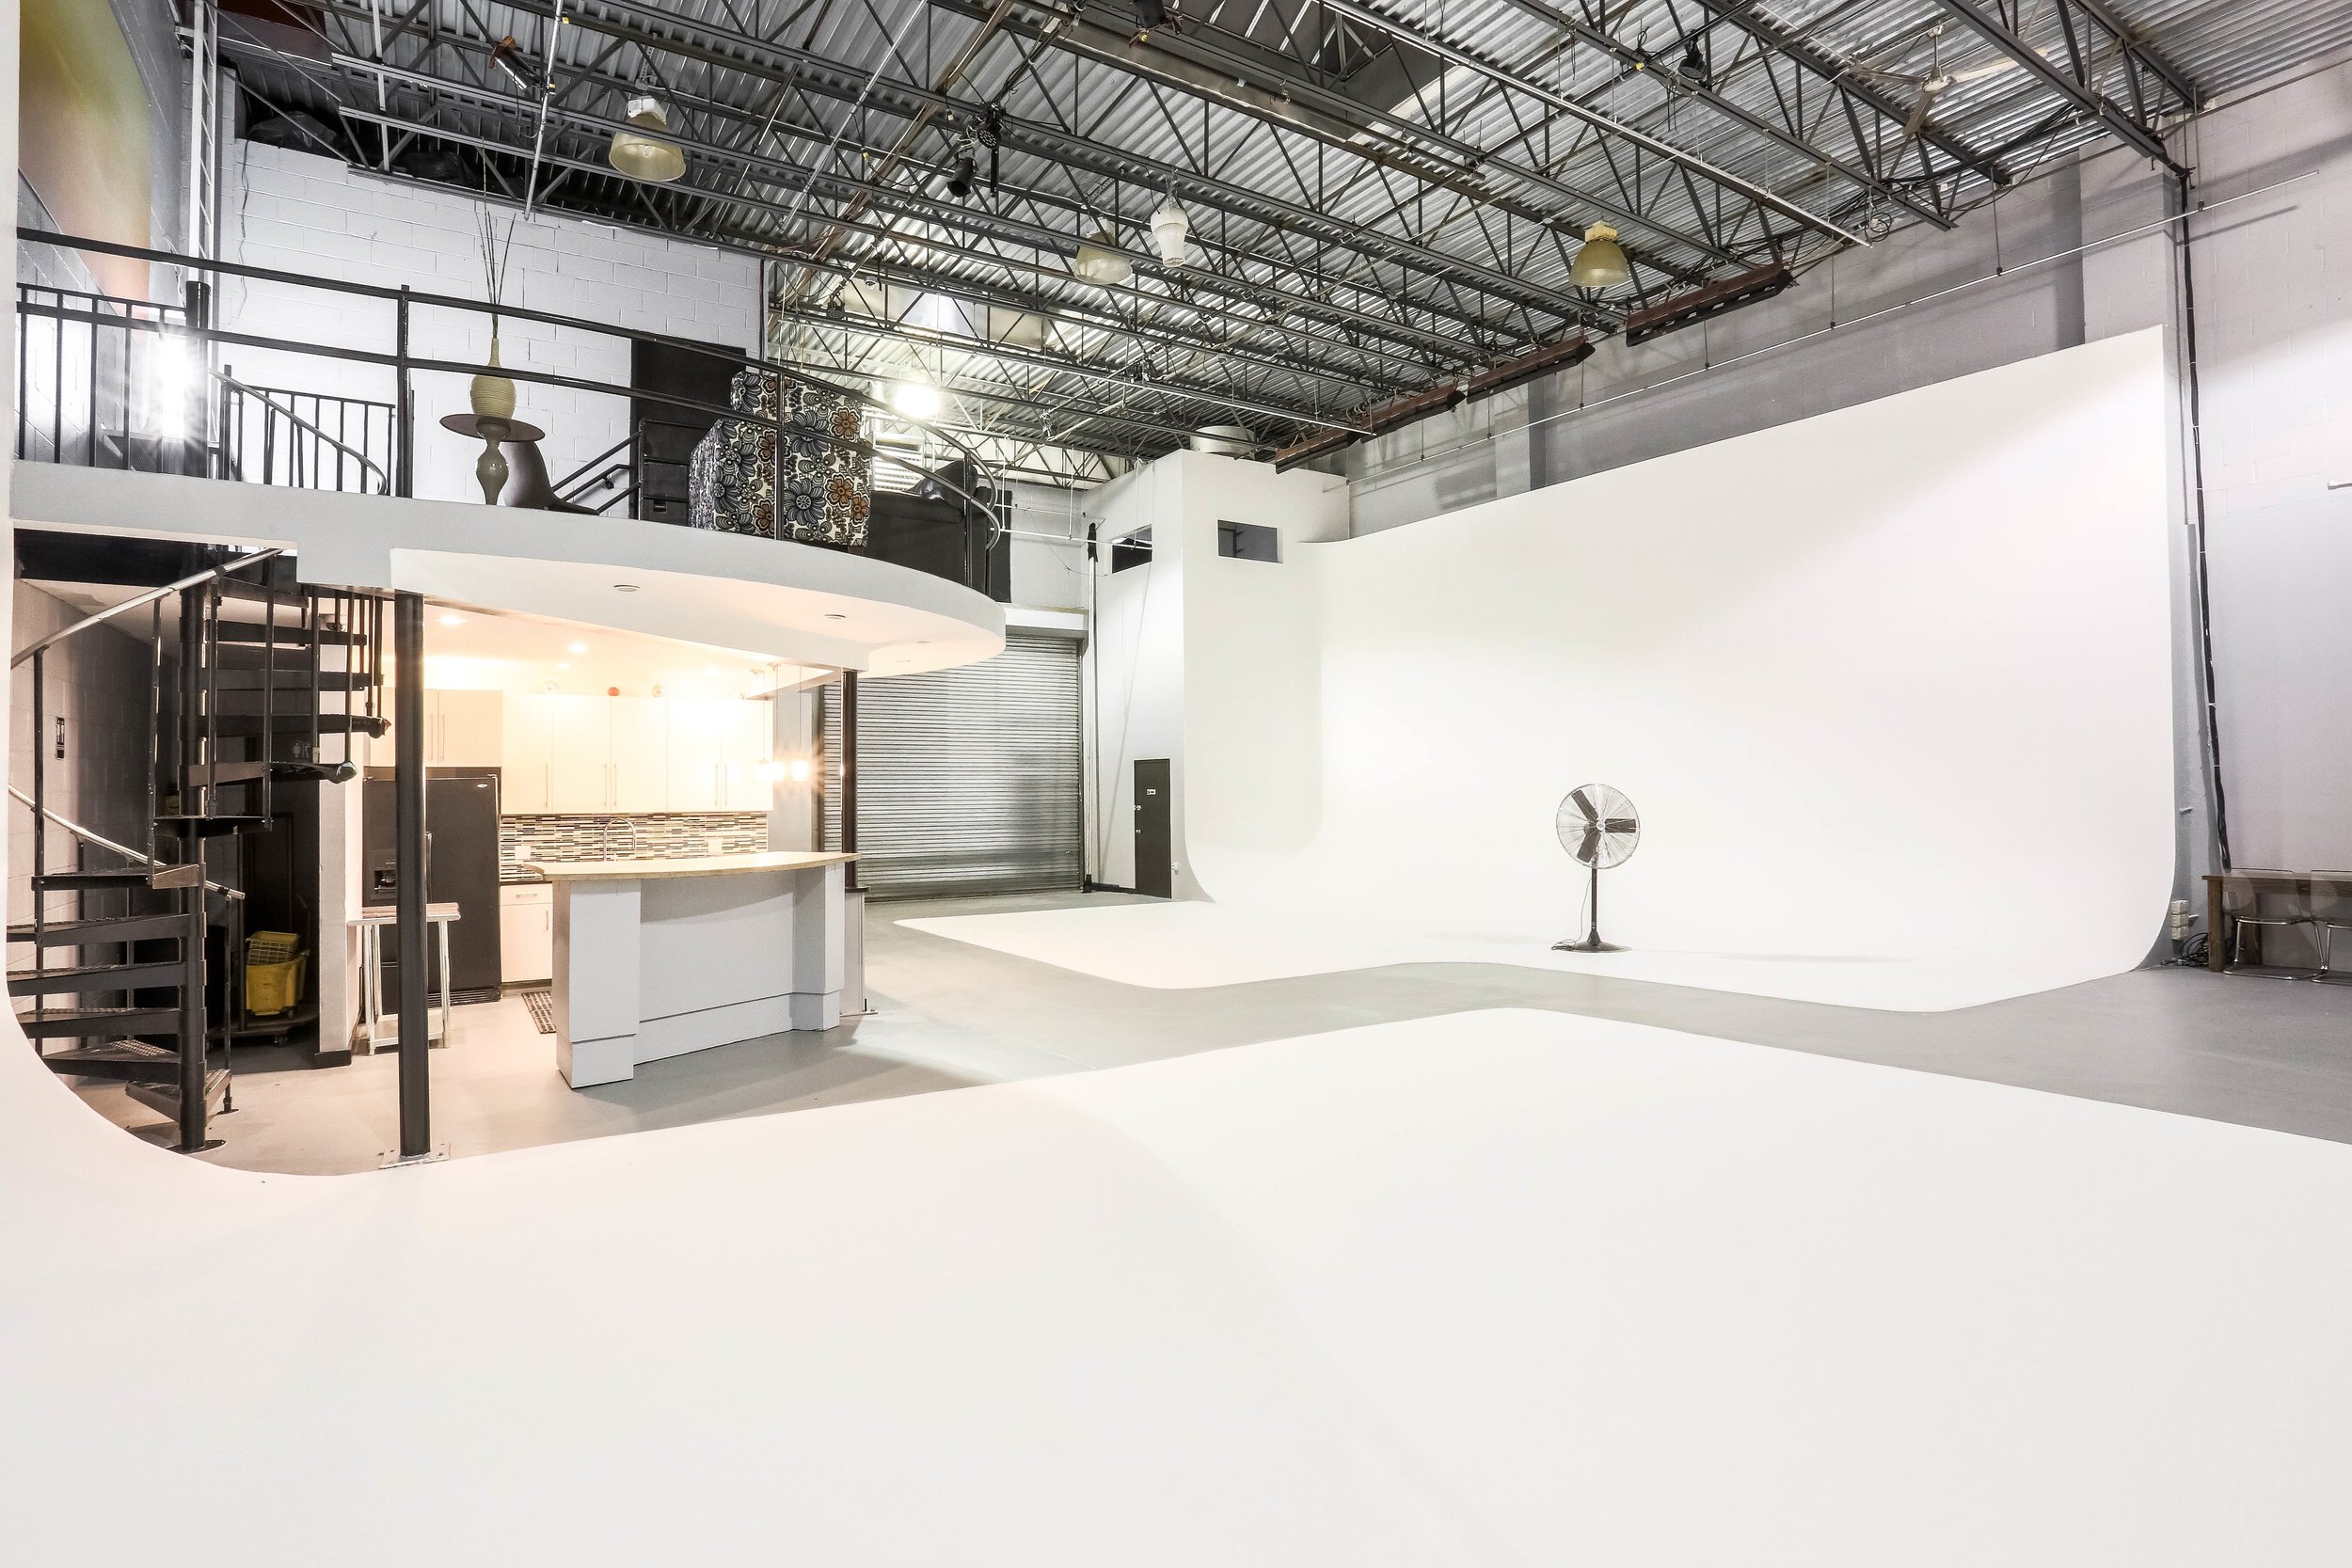 high-ceiling-cyc-studio-nyc.jpg